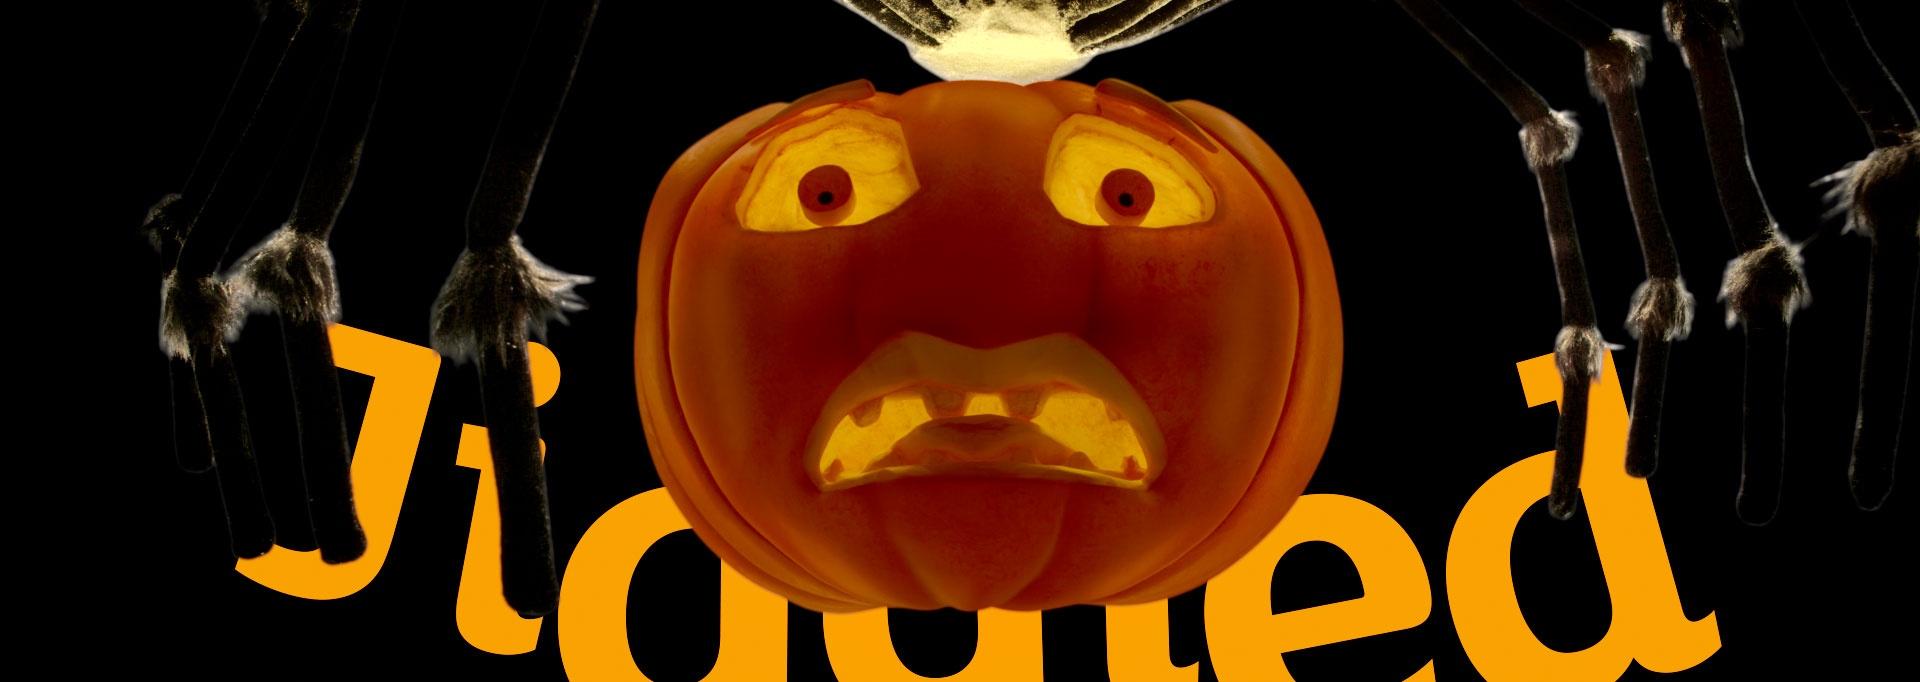 Halloween Creative Ads.New Sainsbury S Ad Is A Creepily Cute Ode To Halloween